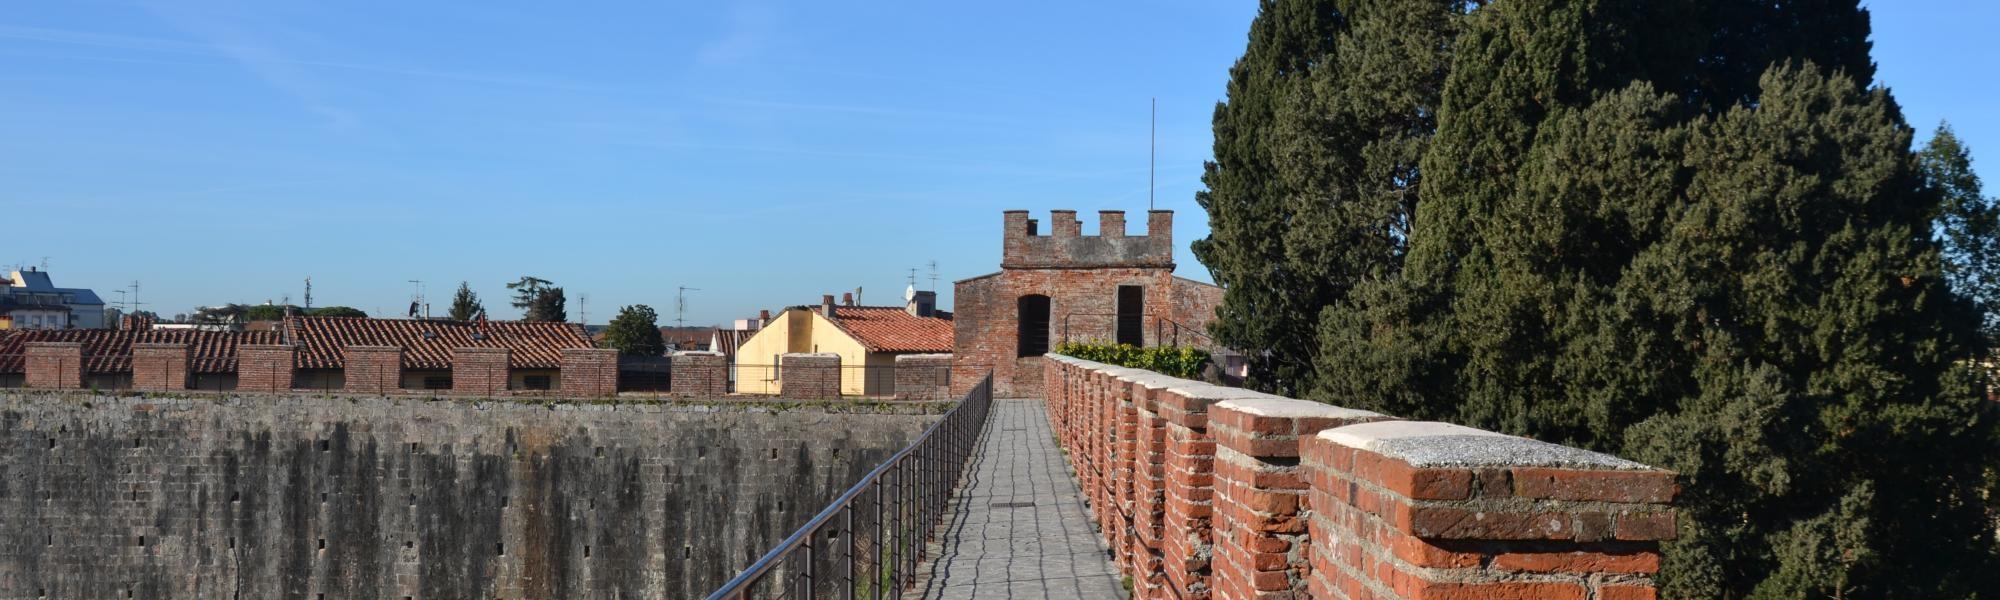 Torre del Catallo ( da Mura di Pisa, www.muradipisa.it)